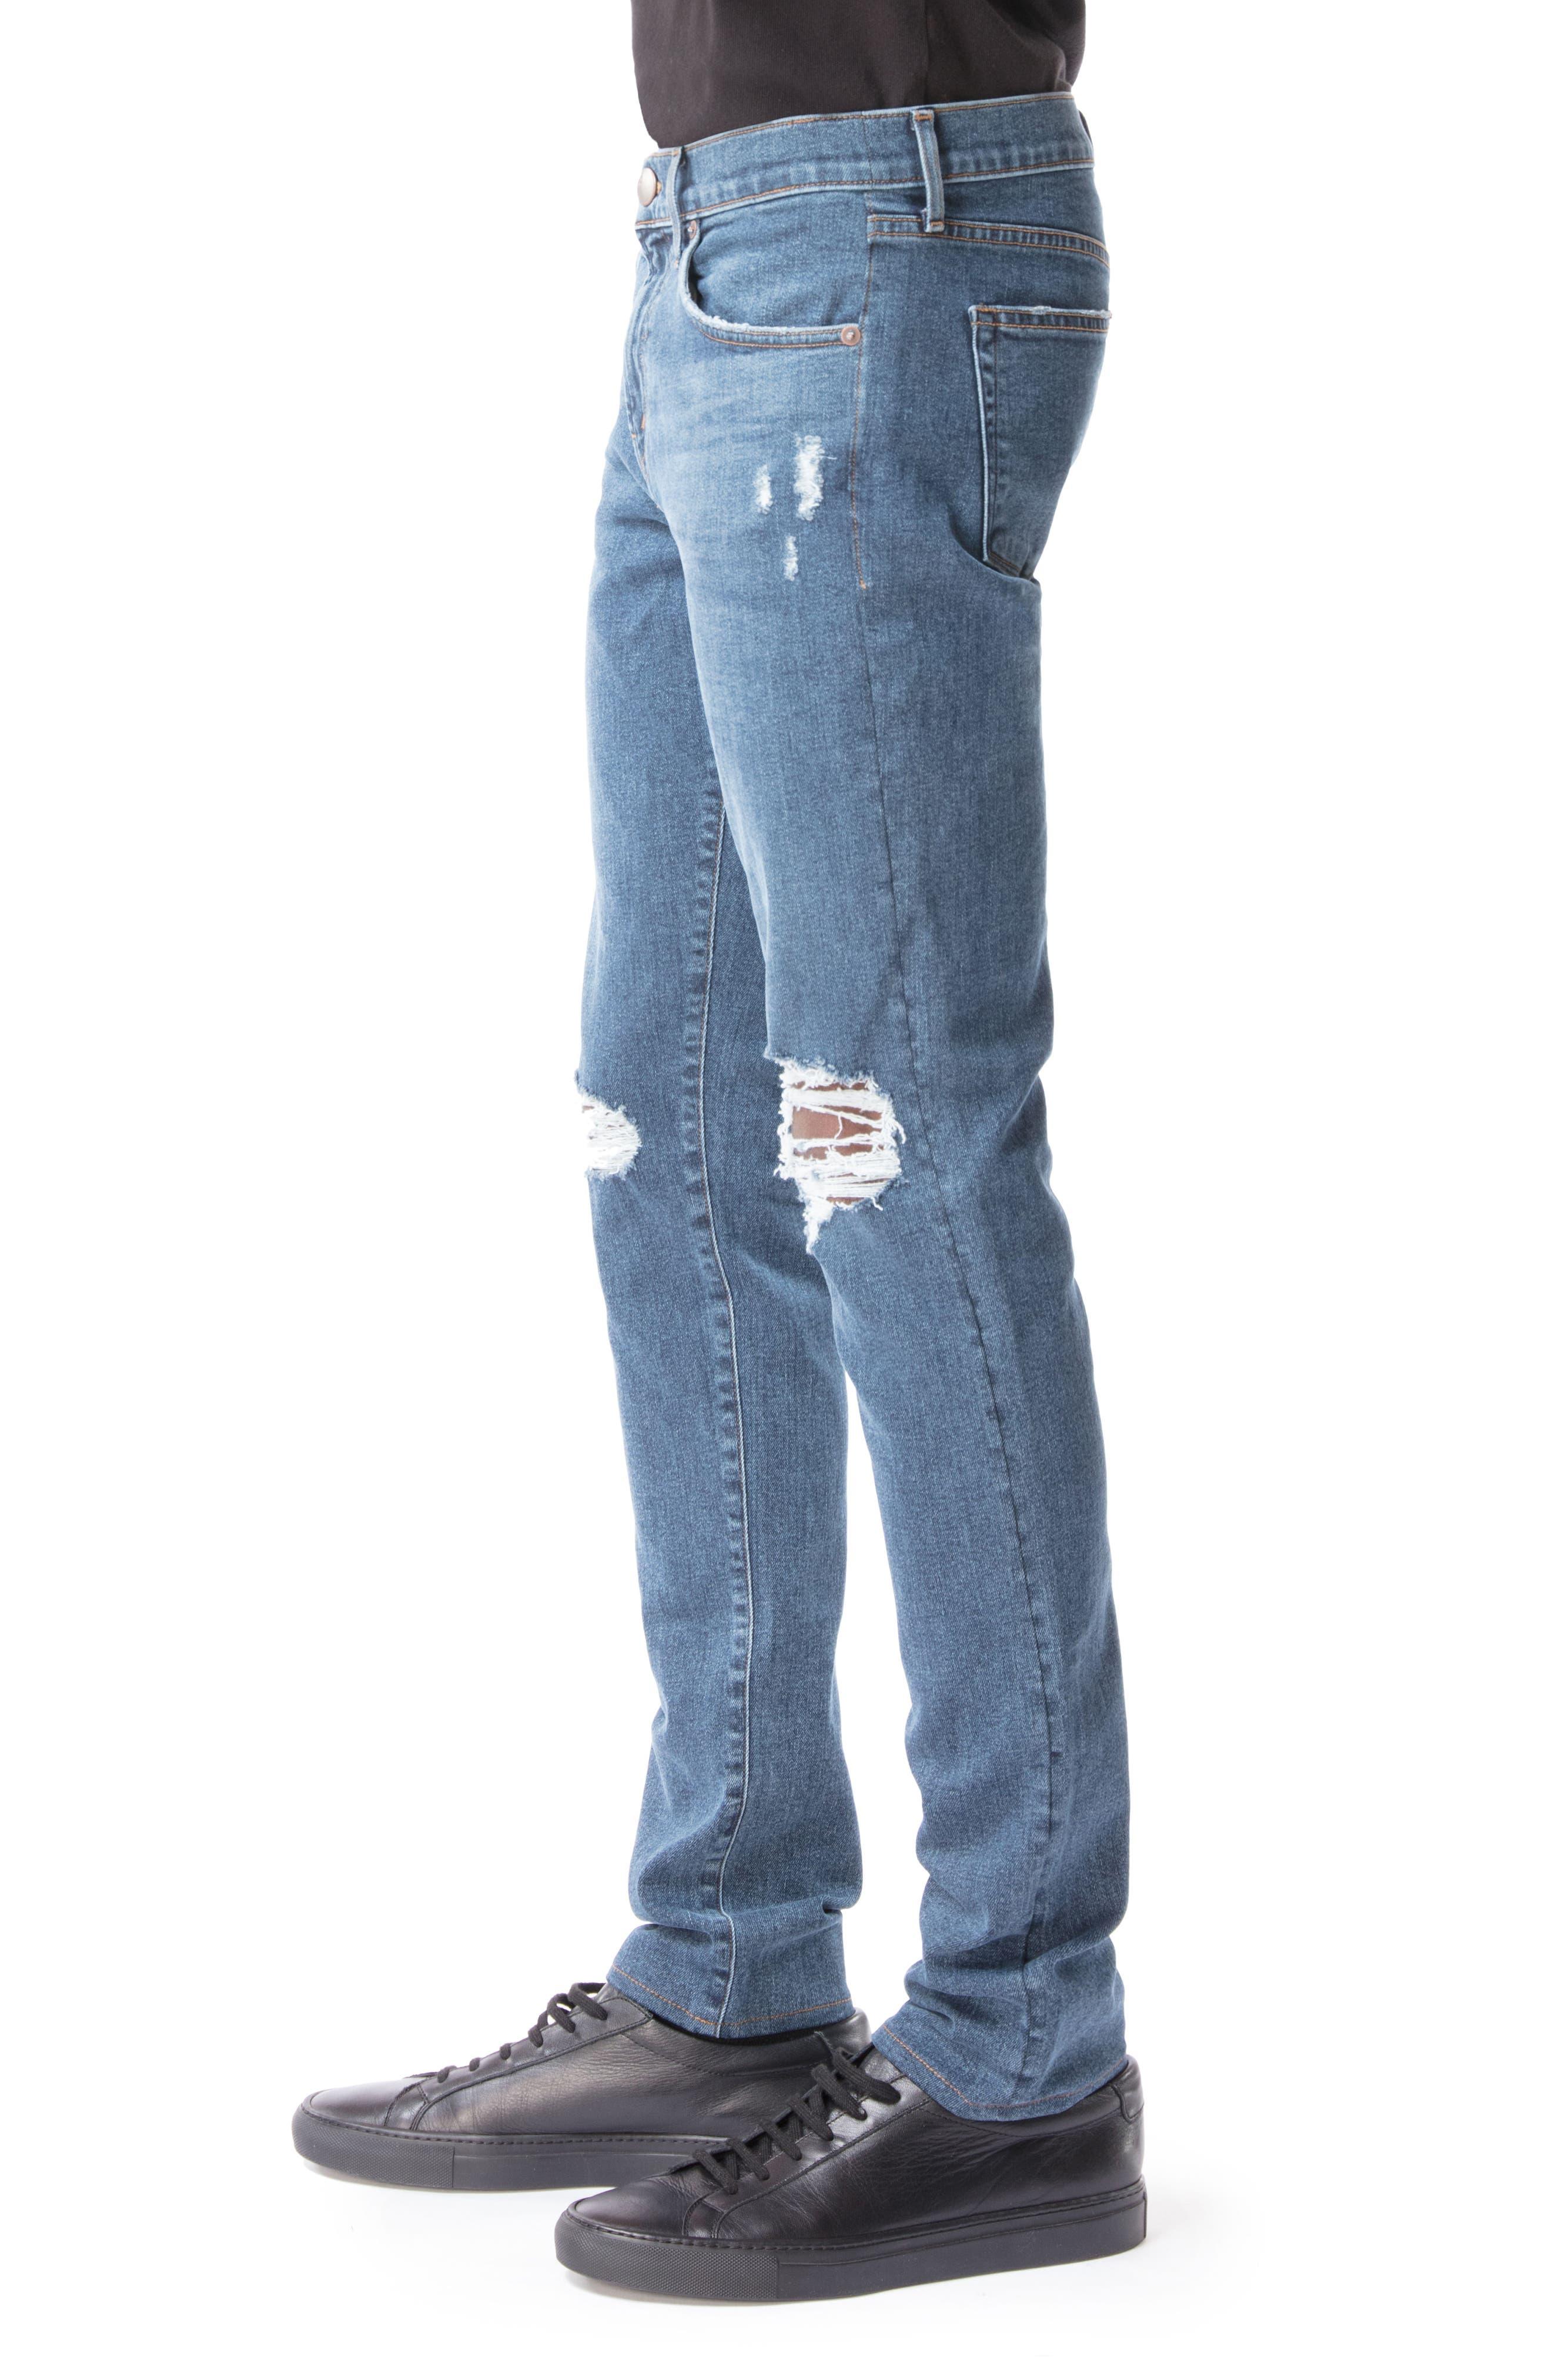 Mick Skinny Fit Jeans,                             Alternate thumbnail 3, color,                             494